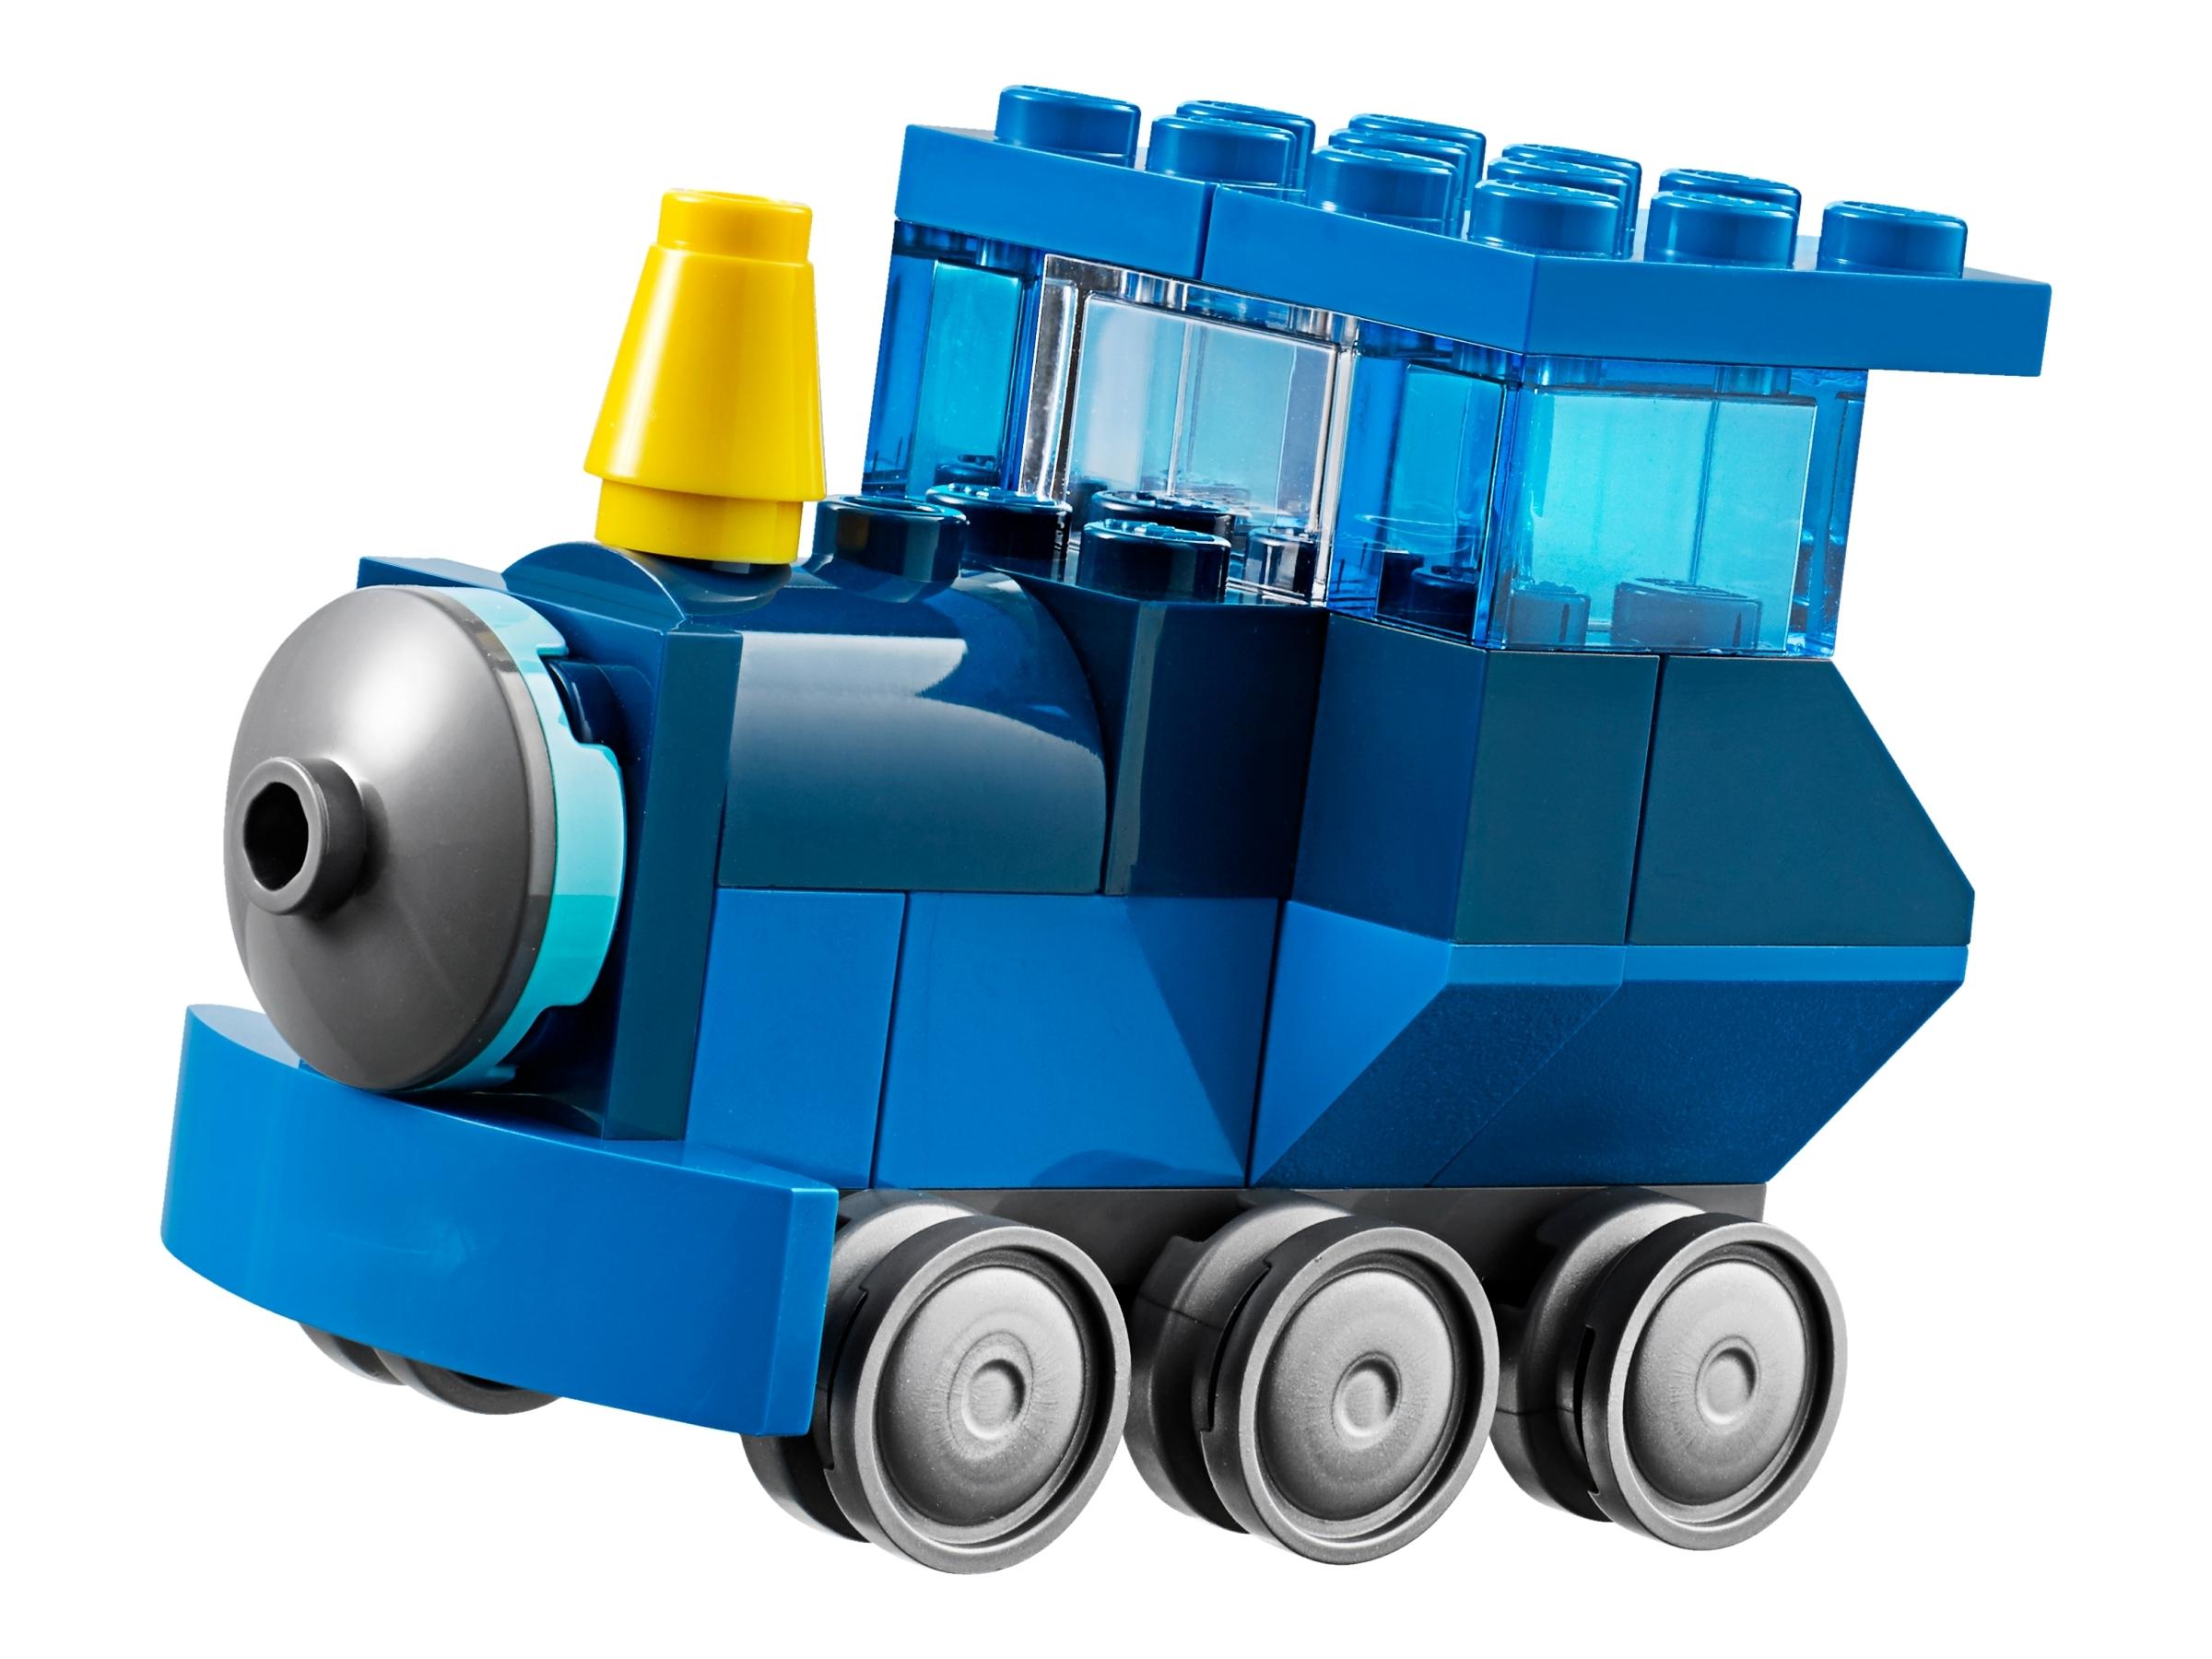 NIB LEGO Classic Blue Creativity Box 10706 Building Kit Sealed